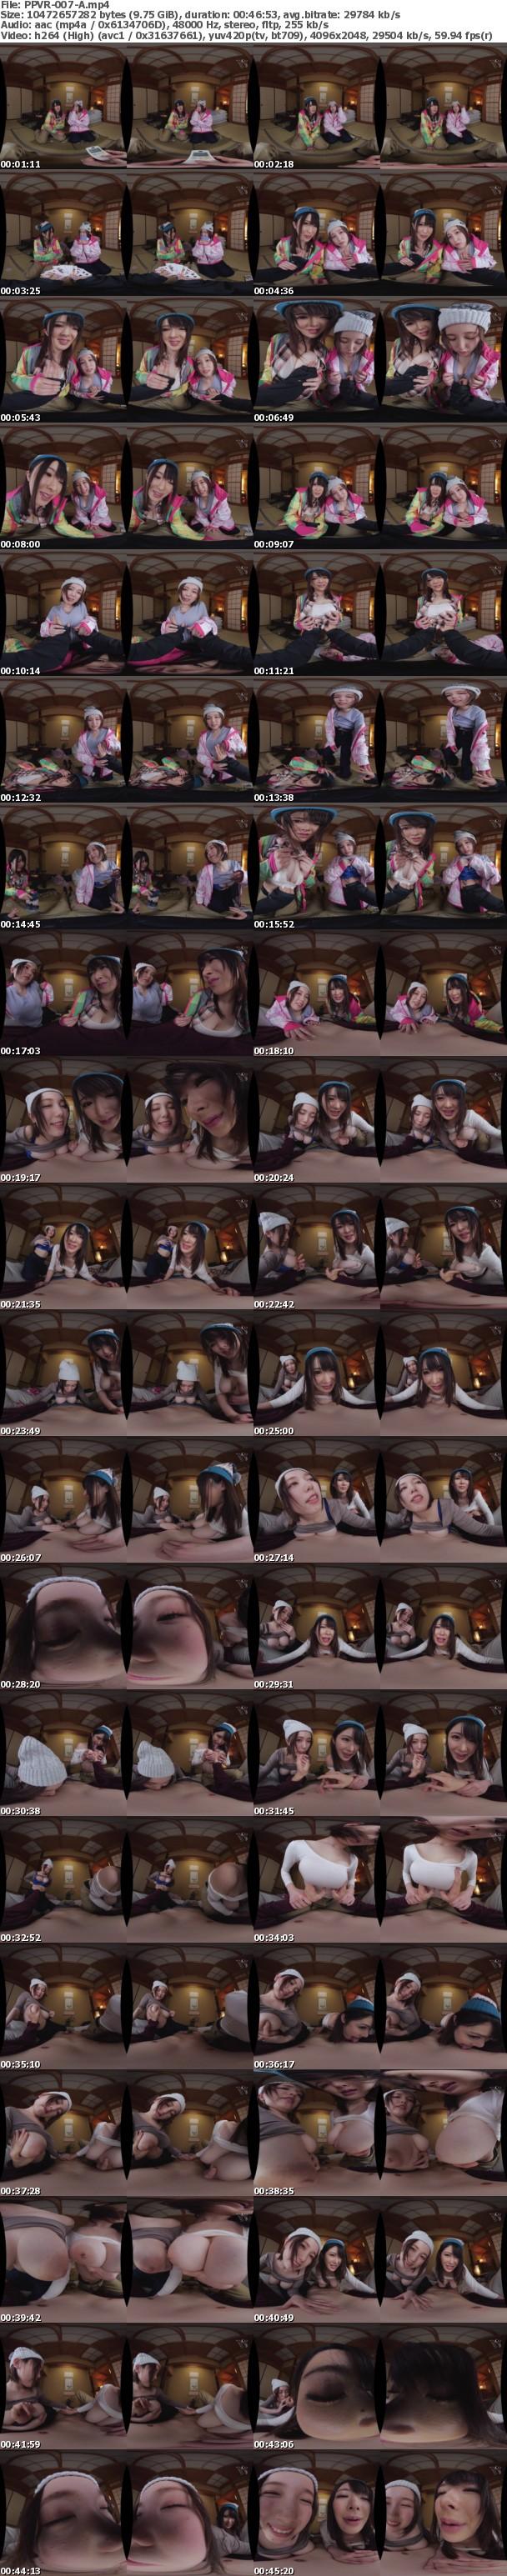 (VR) PPVR-007 スノボ合宿中に暖房が故障!2人の巨乳先輩たちと体を温め合ううちにパイズリおしくらまんじゅう状態!ぬくぬく暖取り逆3PVR